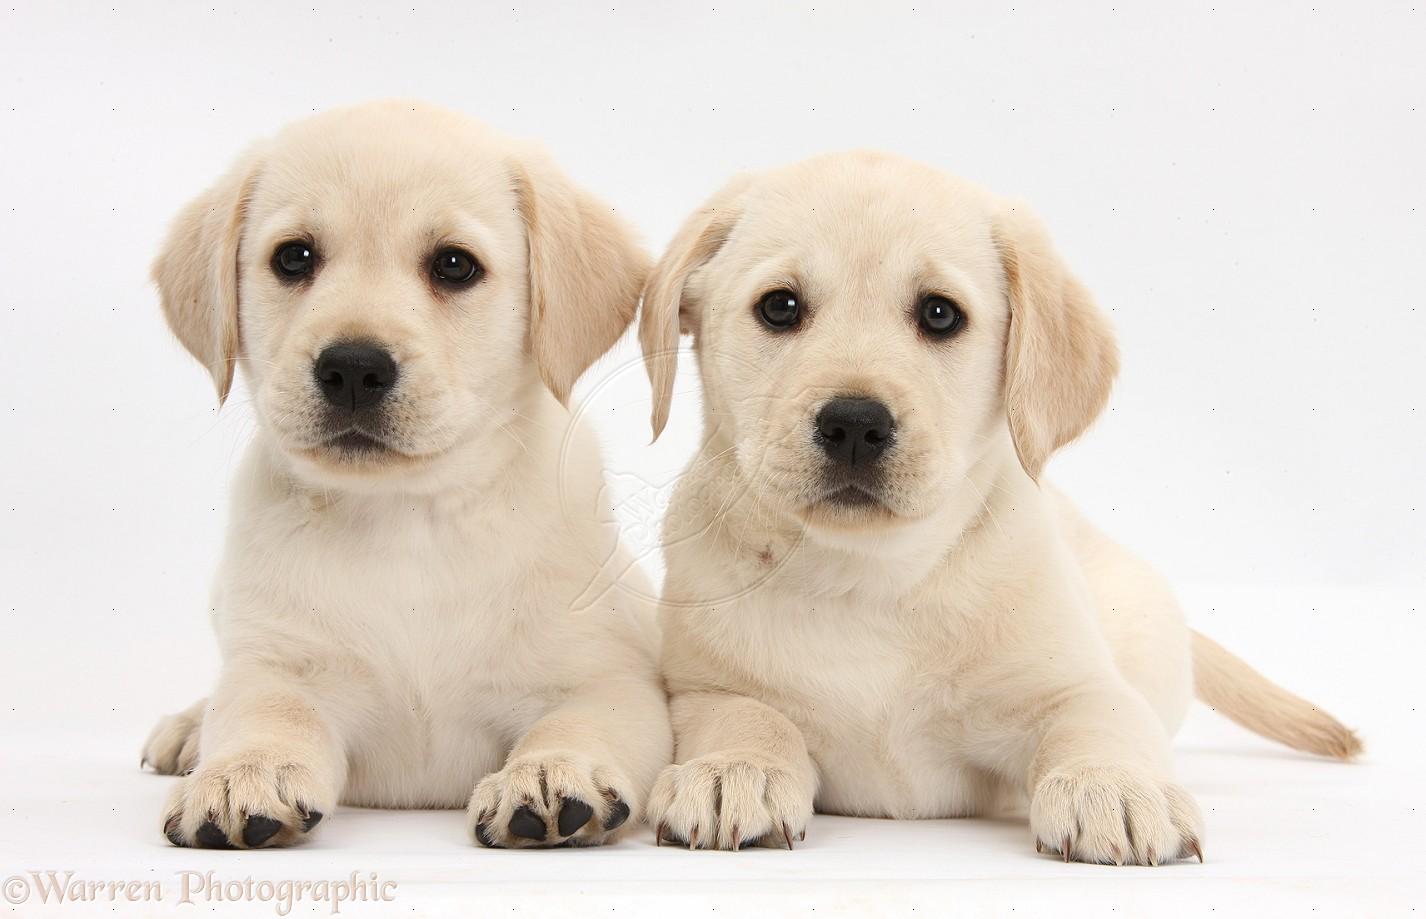 12 Animals Desktop Wallpapers 922004 Yellow Labrador Puppies Photos 1426x919